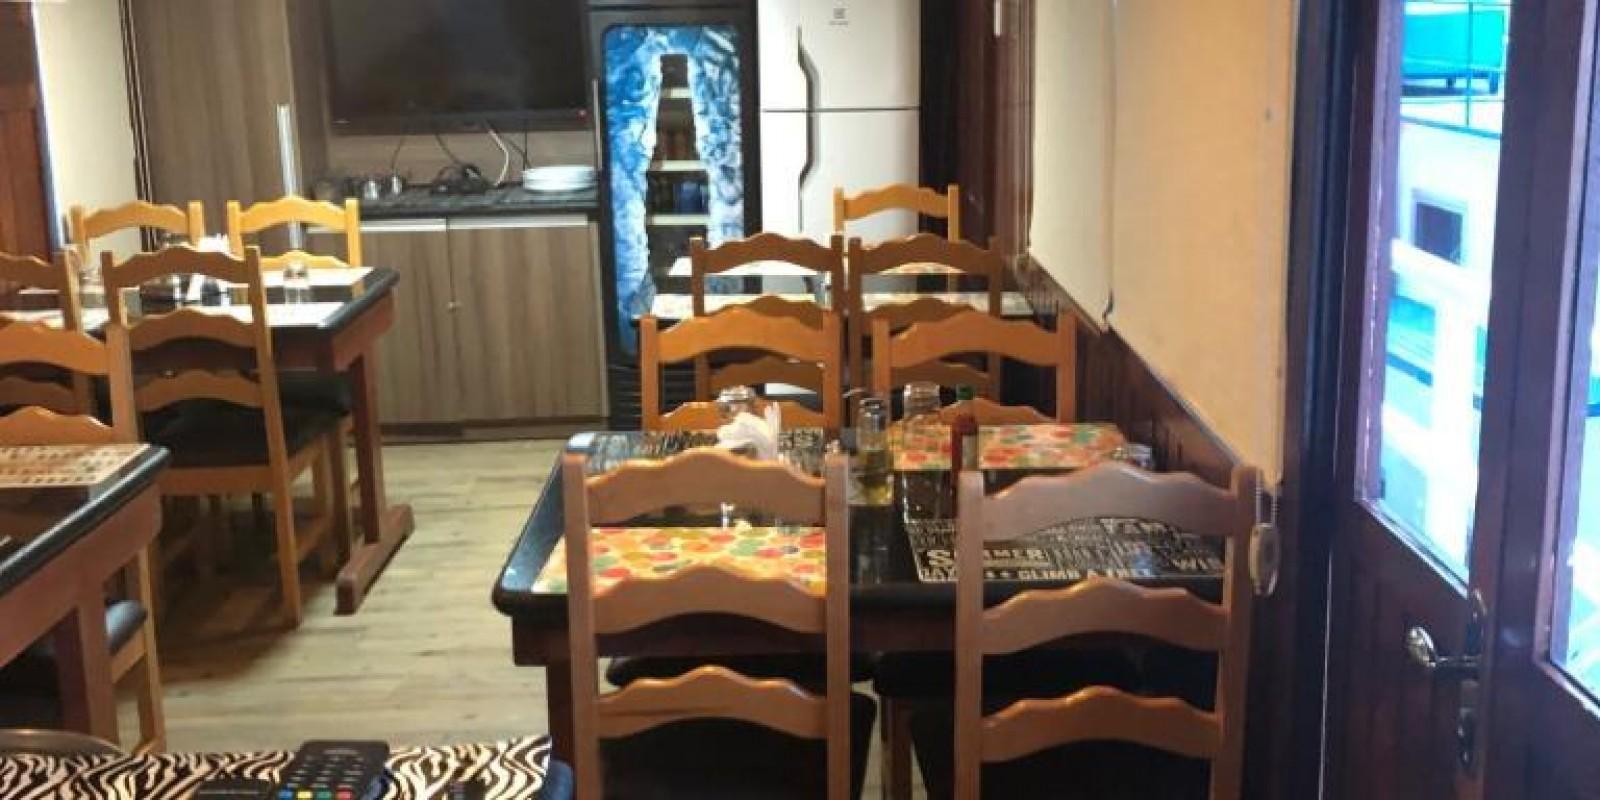 Barco Hotel Paola II - Corumbá - 20 pessoas  - Foto 9 de 16